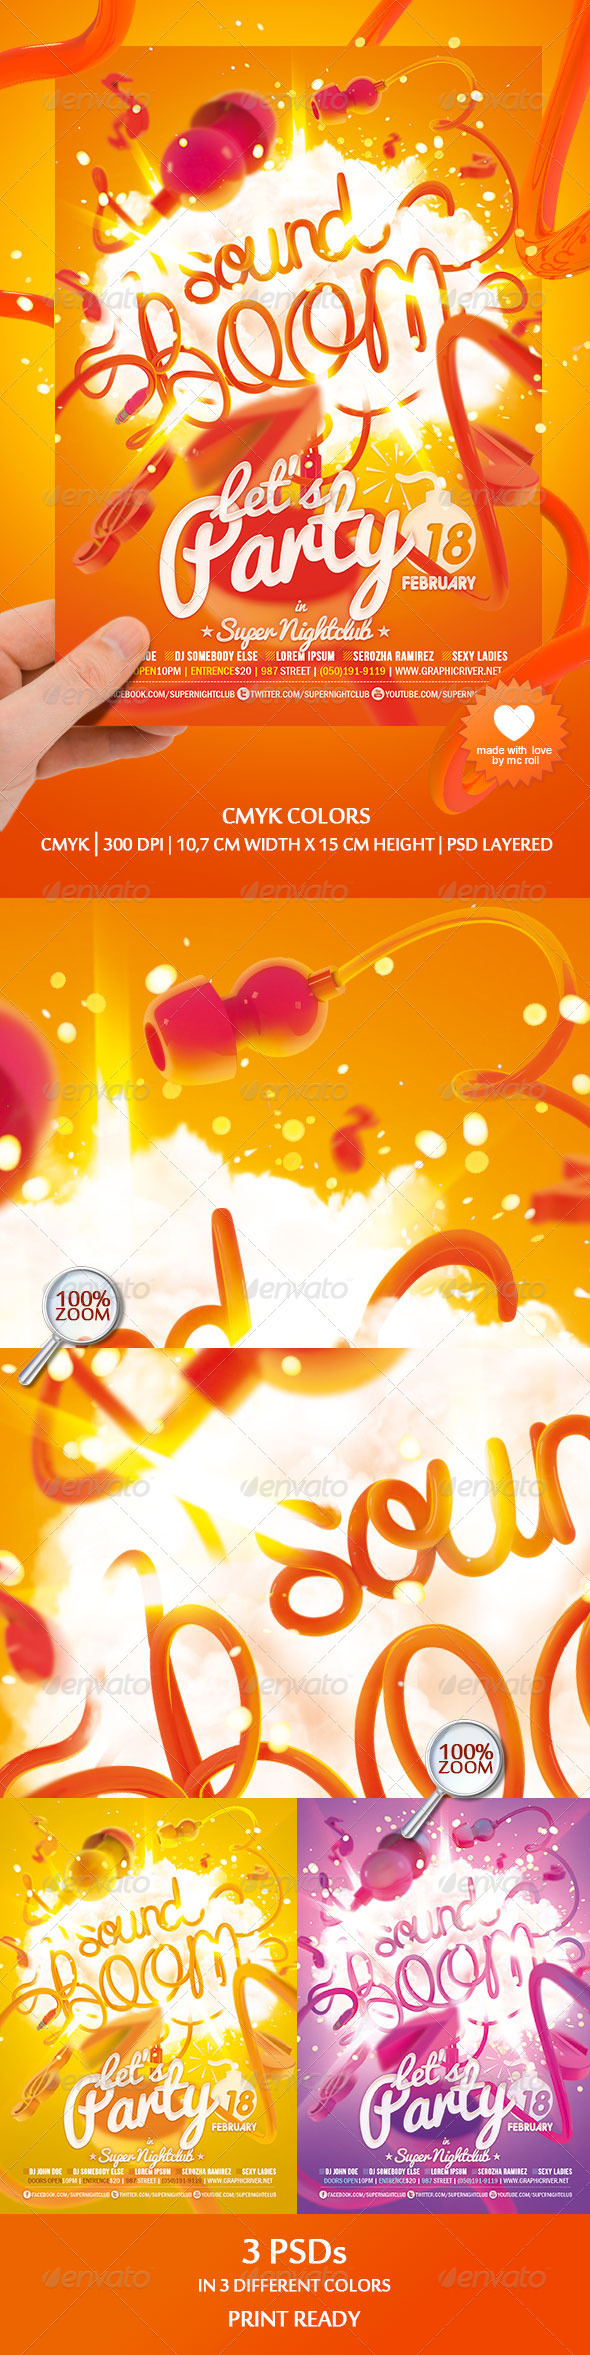 GraphicRiver Sound Boom Nightclub Flyer 3269803